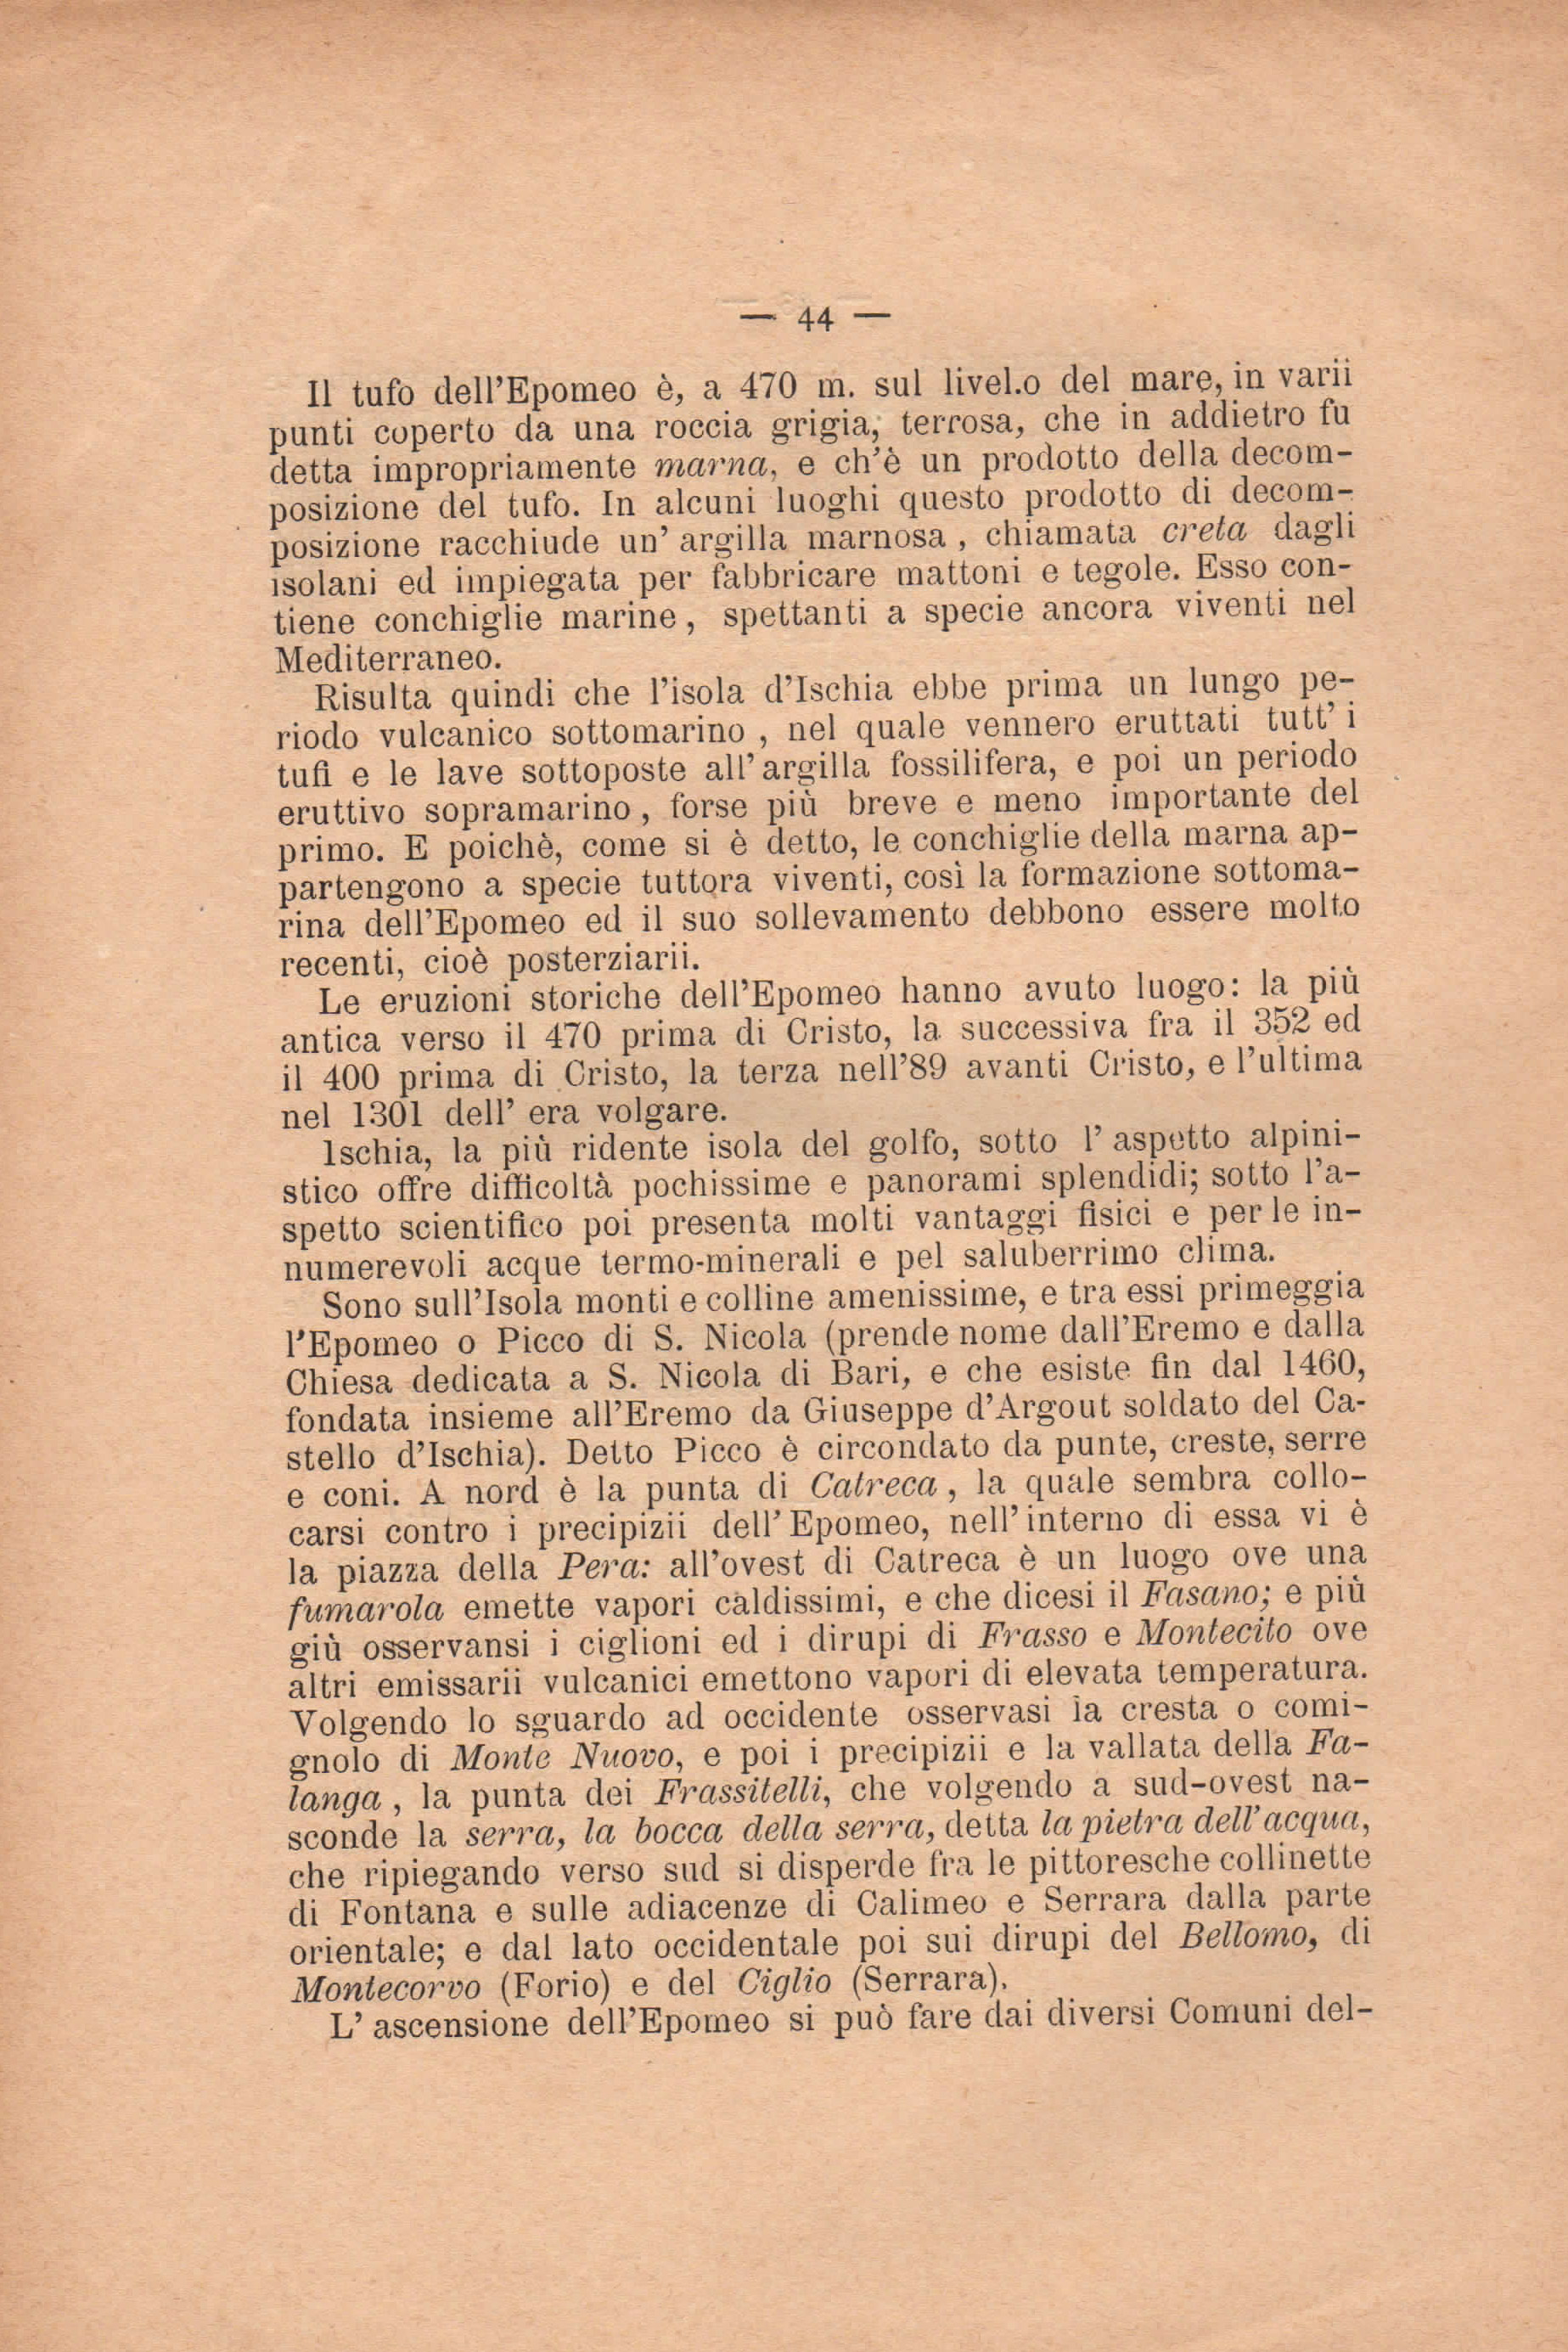 CAI Ischia - documento del 1893